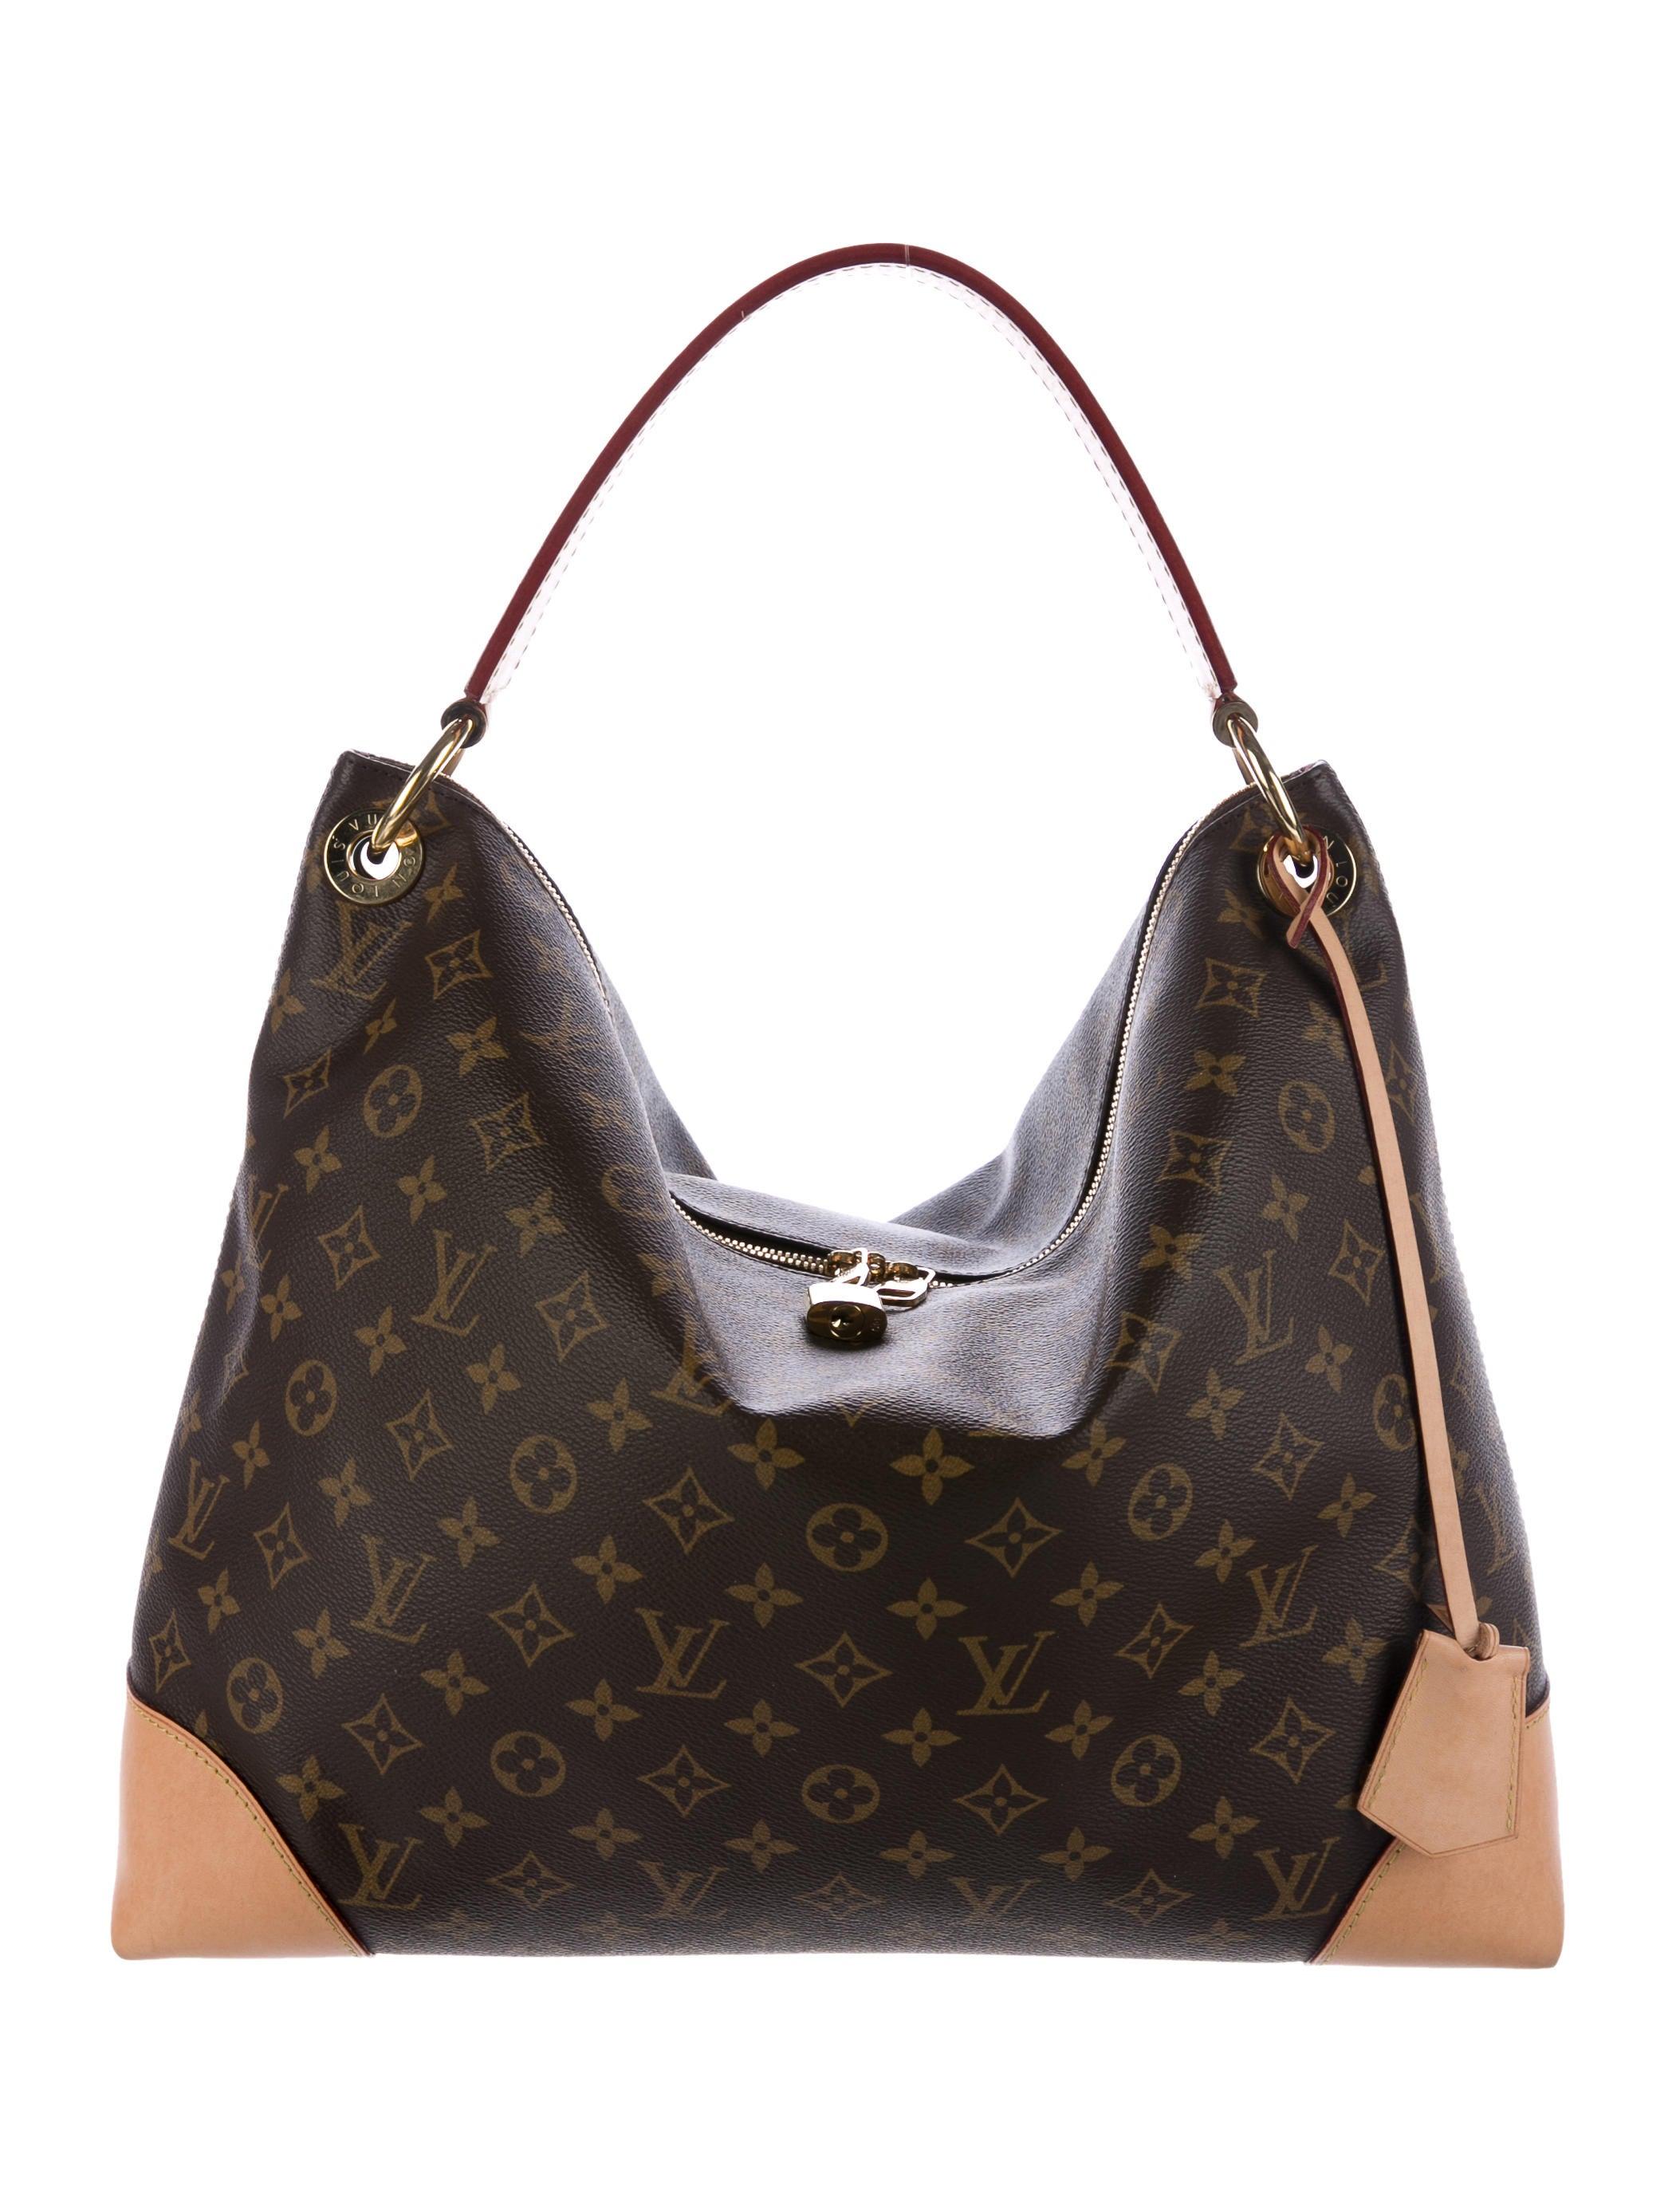 747df5eadecfb Louis Vuitton 2017 Monogram Berri MM - Handbags - LOU128593